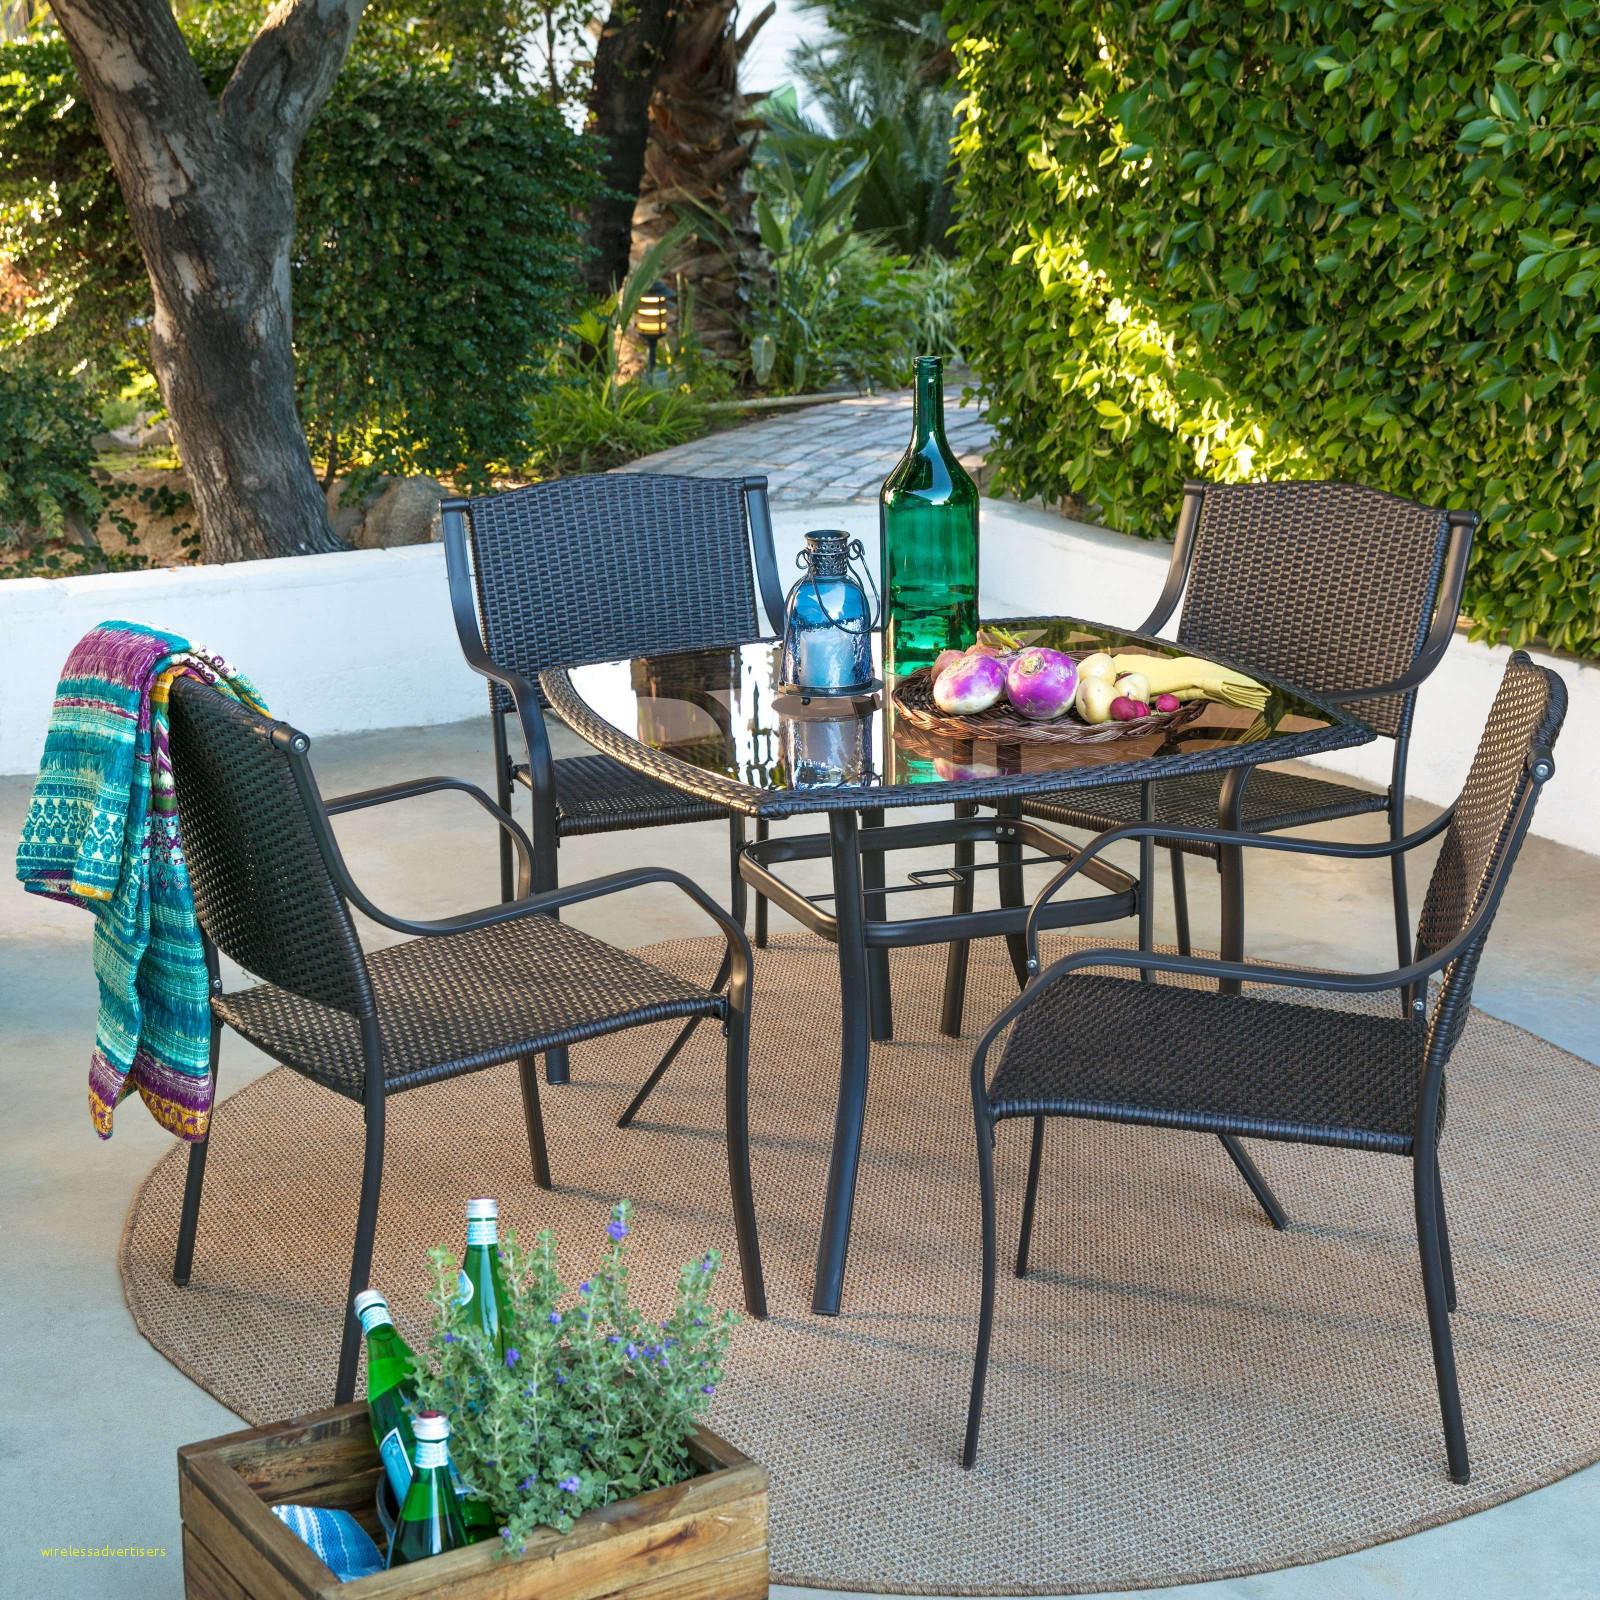 outdoor table vase of 28 luxury outdoor garden plants architecture regarding rustic outdoor decor ideas coral coast patio furniture fresh wicker outdoor sofa 0d patio design ideas